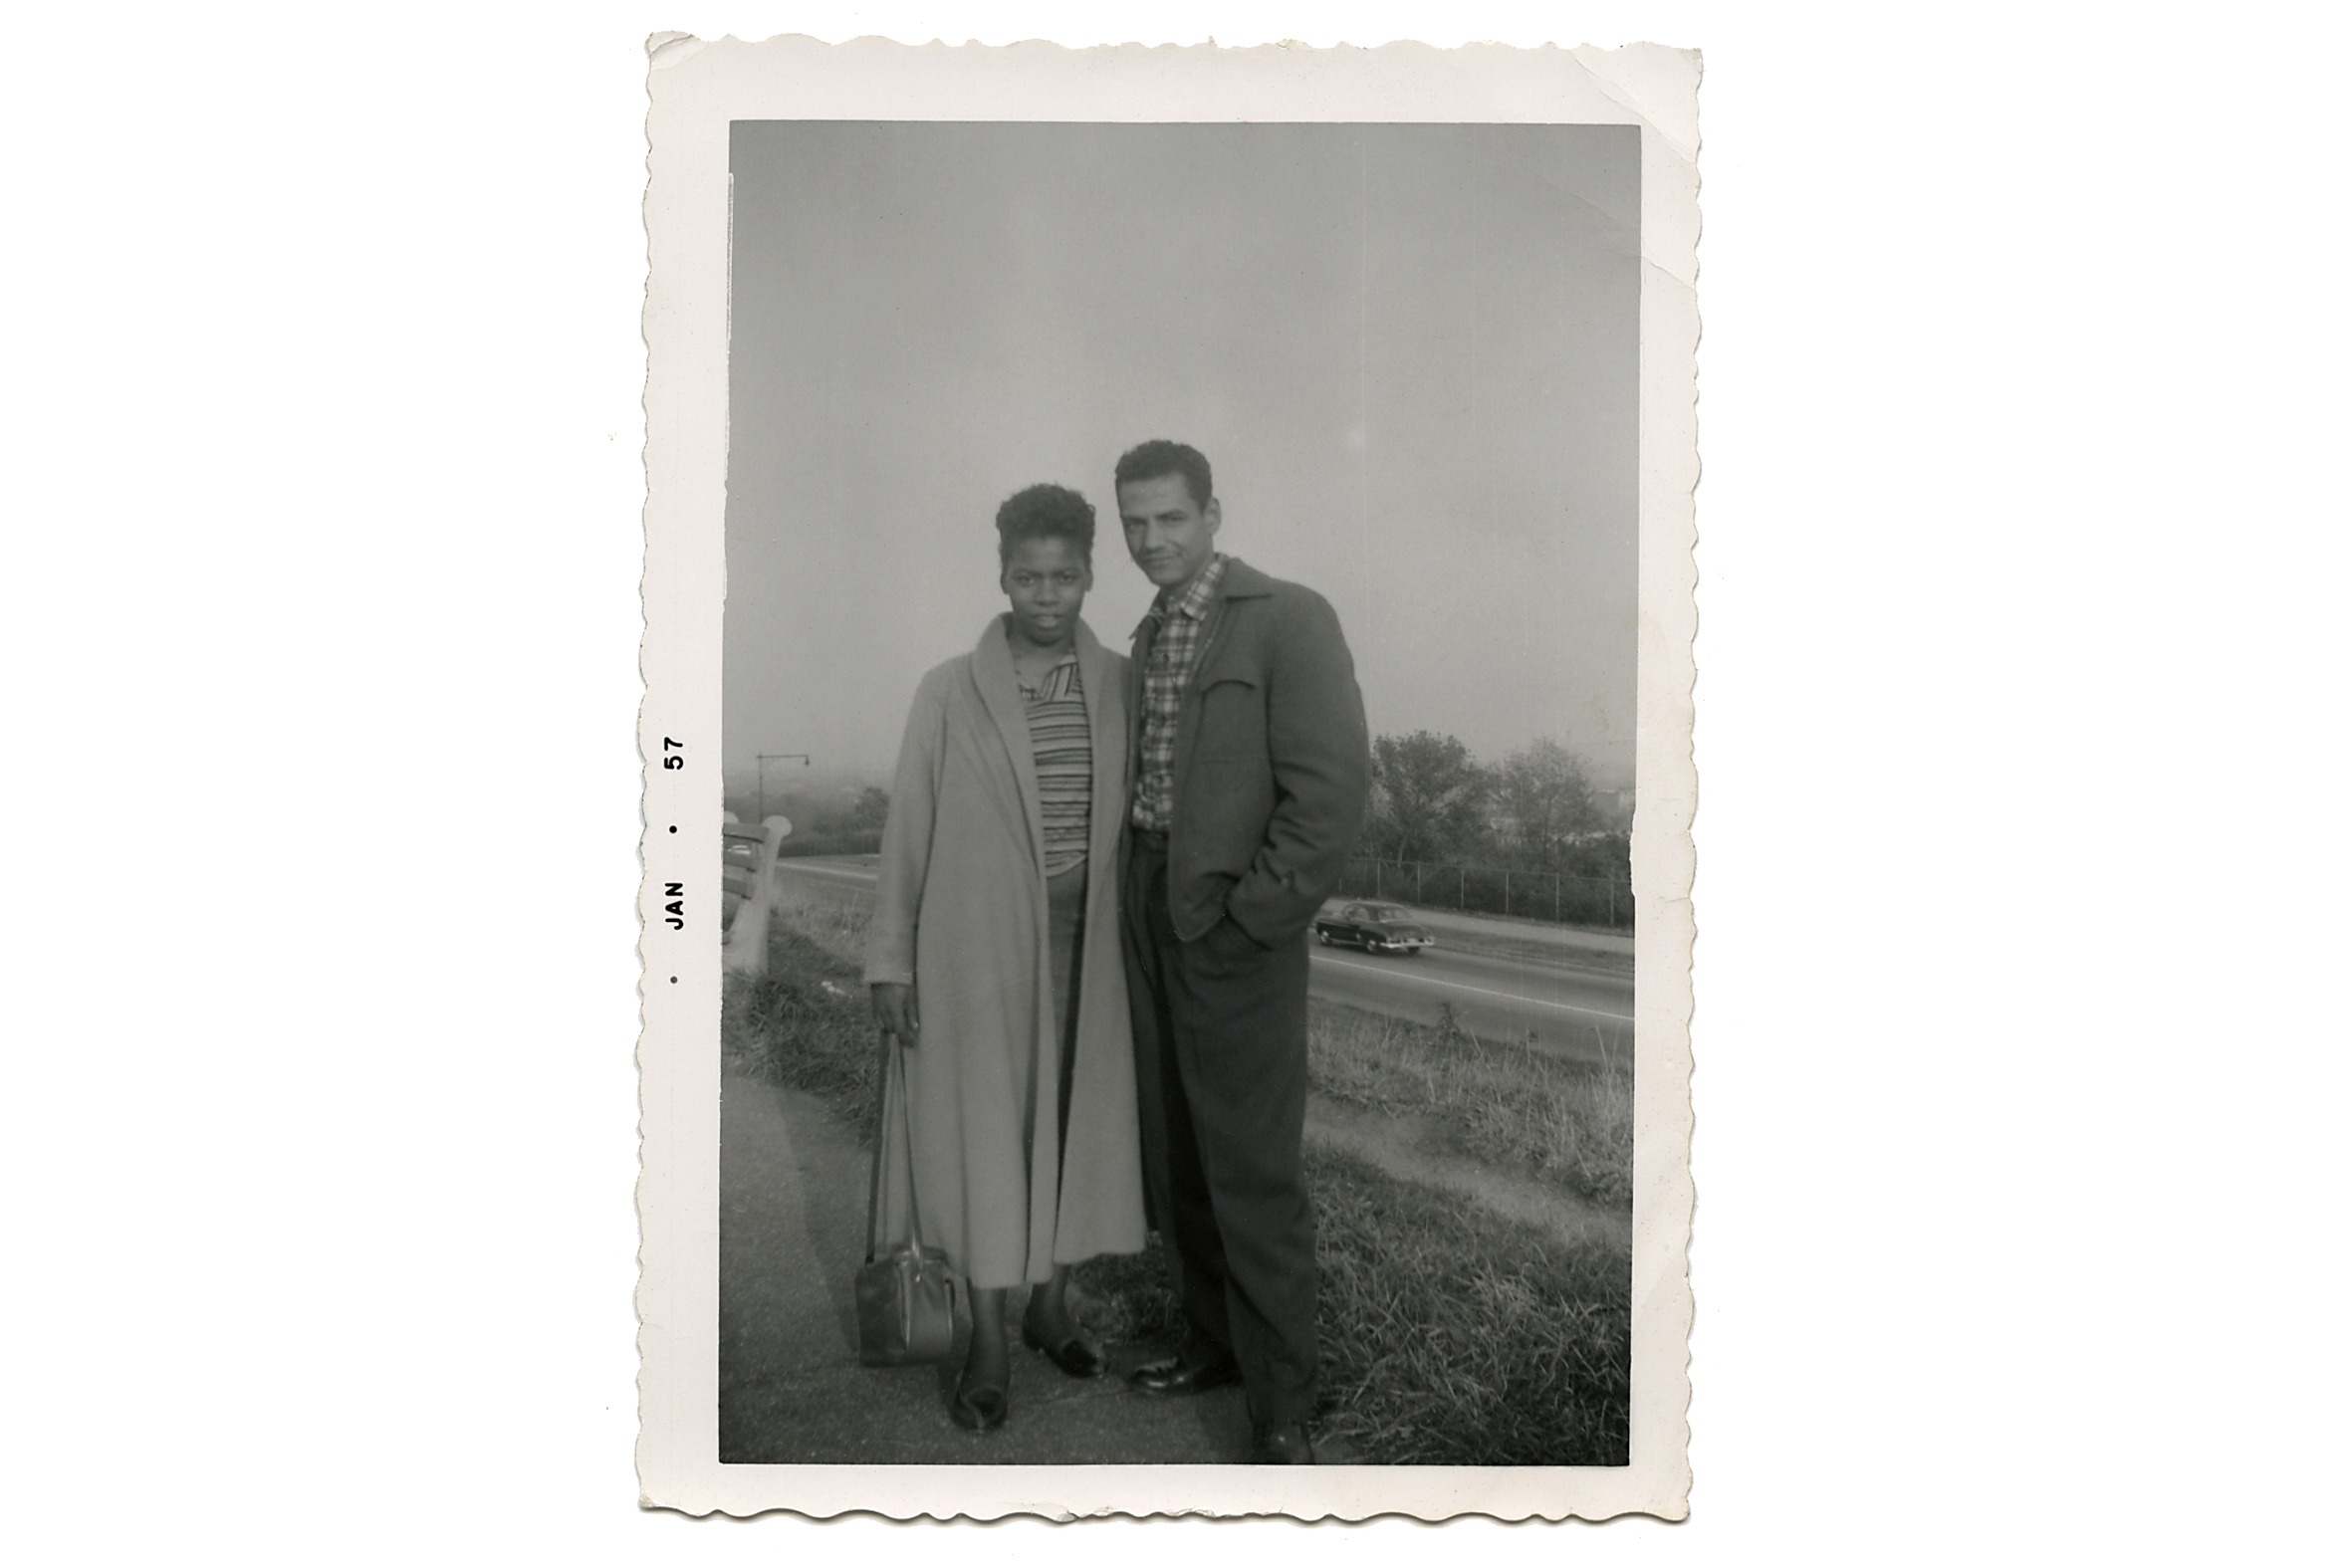 Mary E. Lemons and Garfield Lee, c. 1957